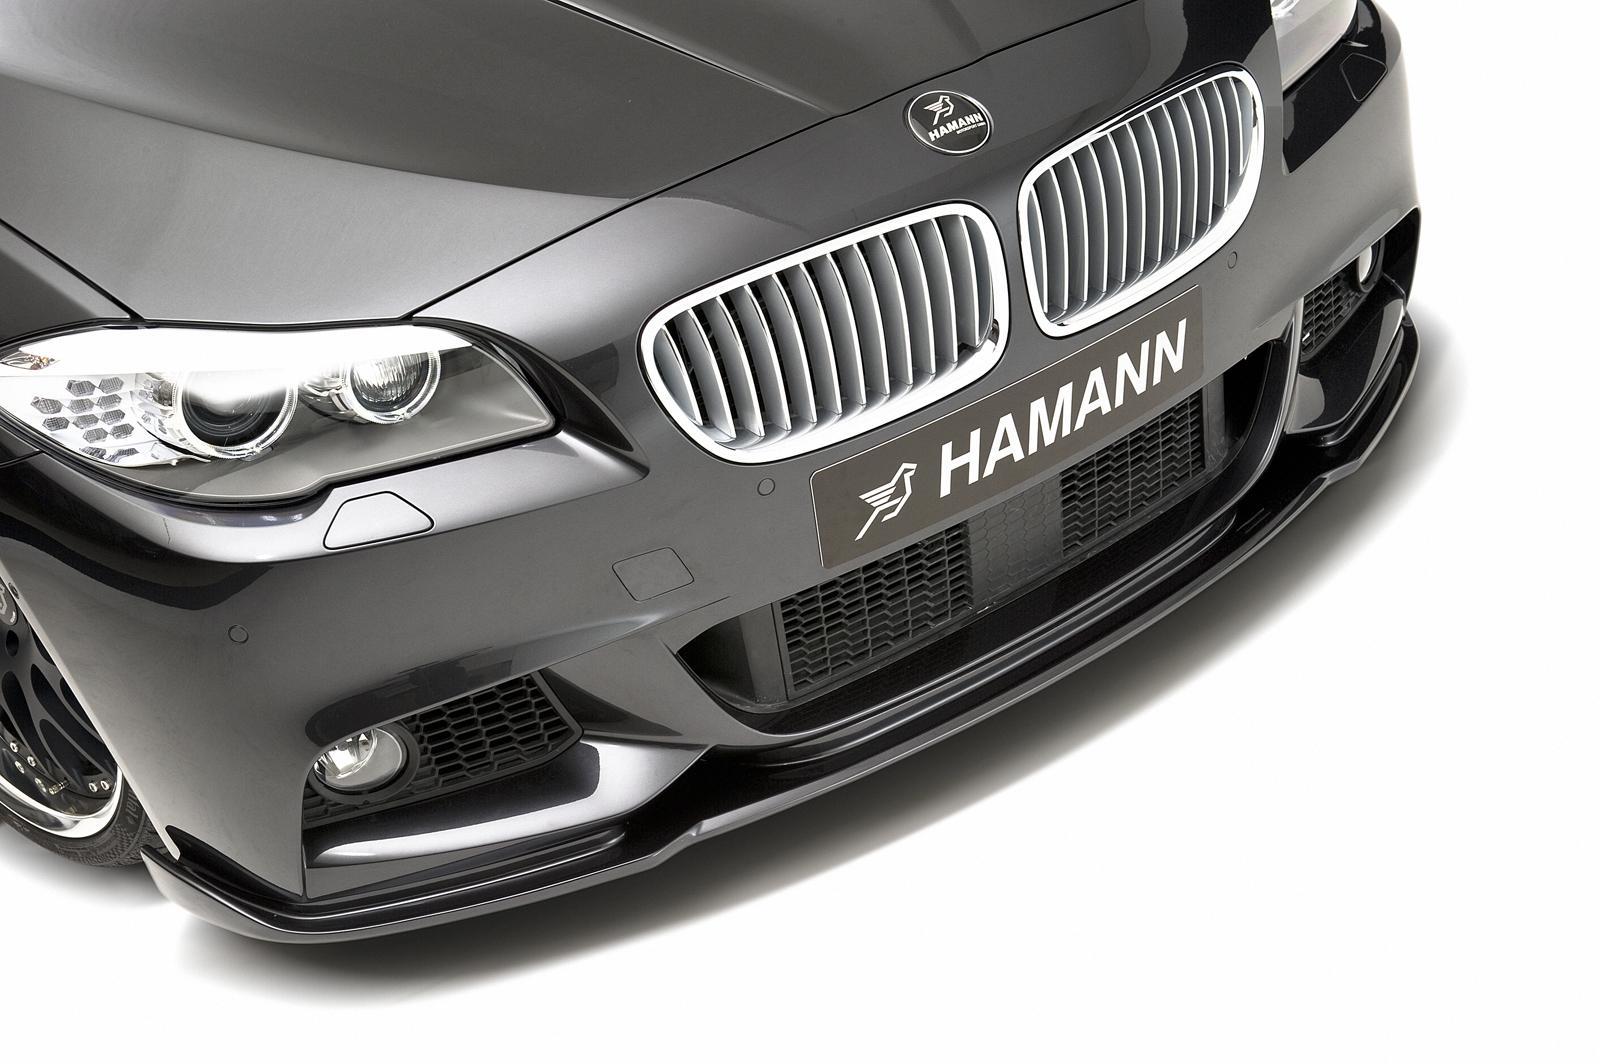 BMW Serie 5 Pacchetto M by Hamann